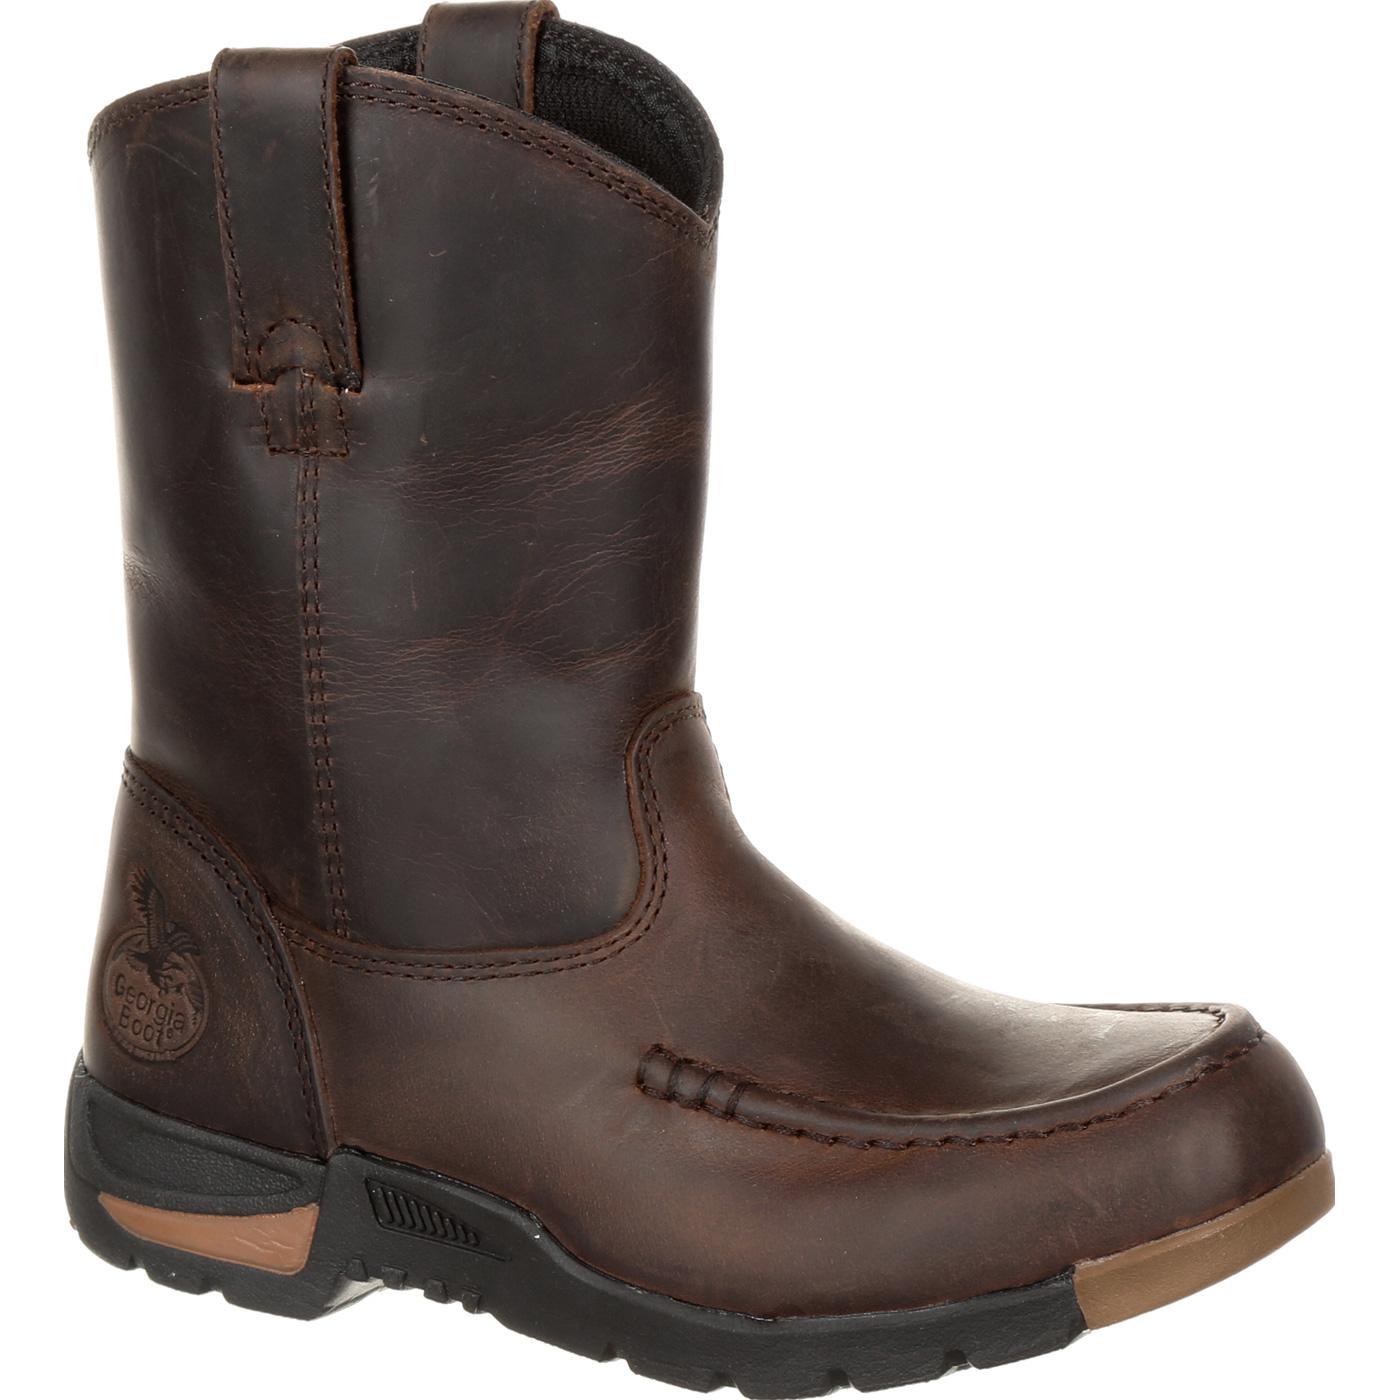 a760508b82c Kid's Work Boots | Georgia Boot